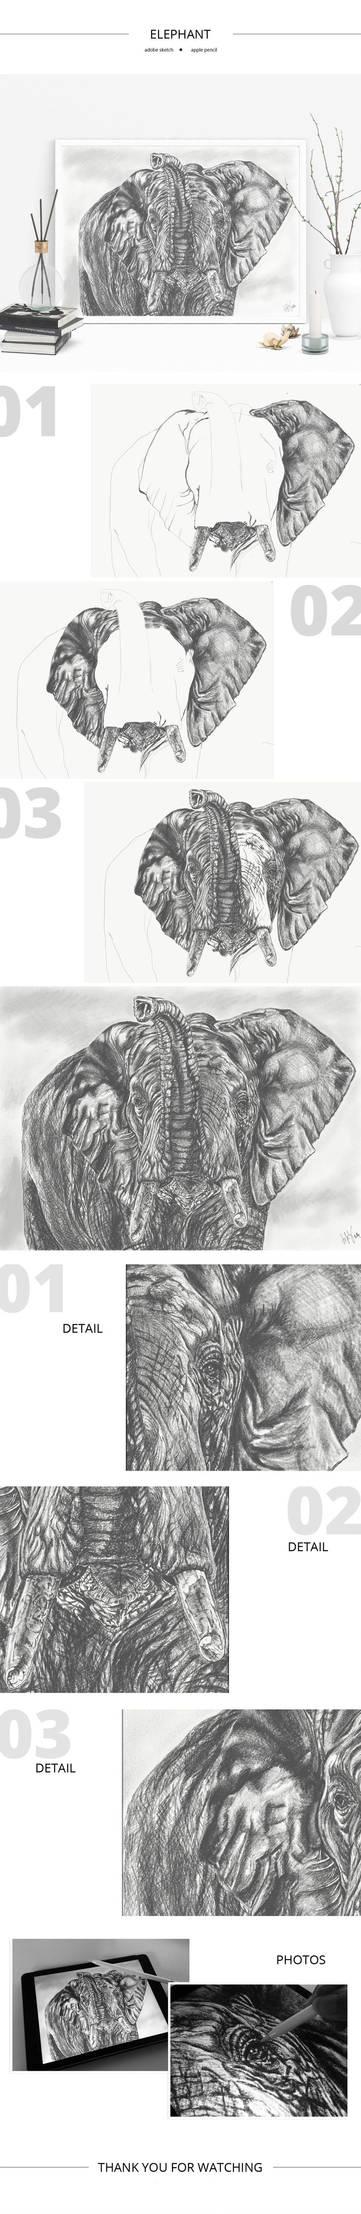 Elephant sketch by Lifety